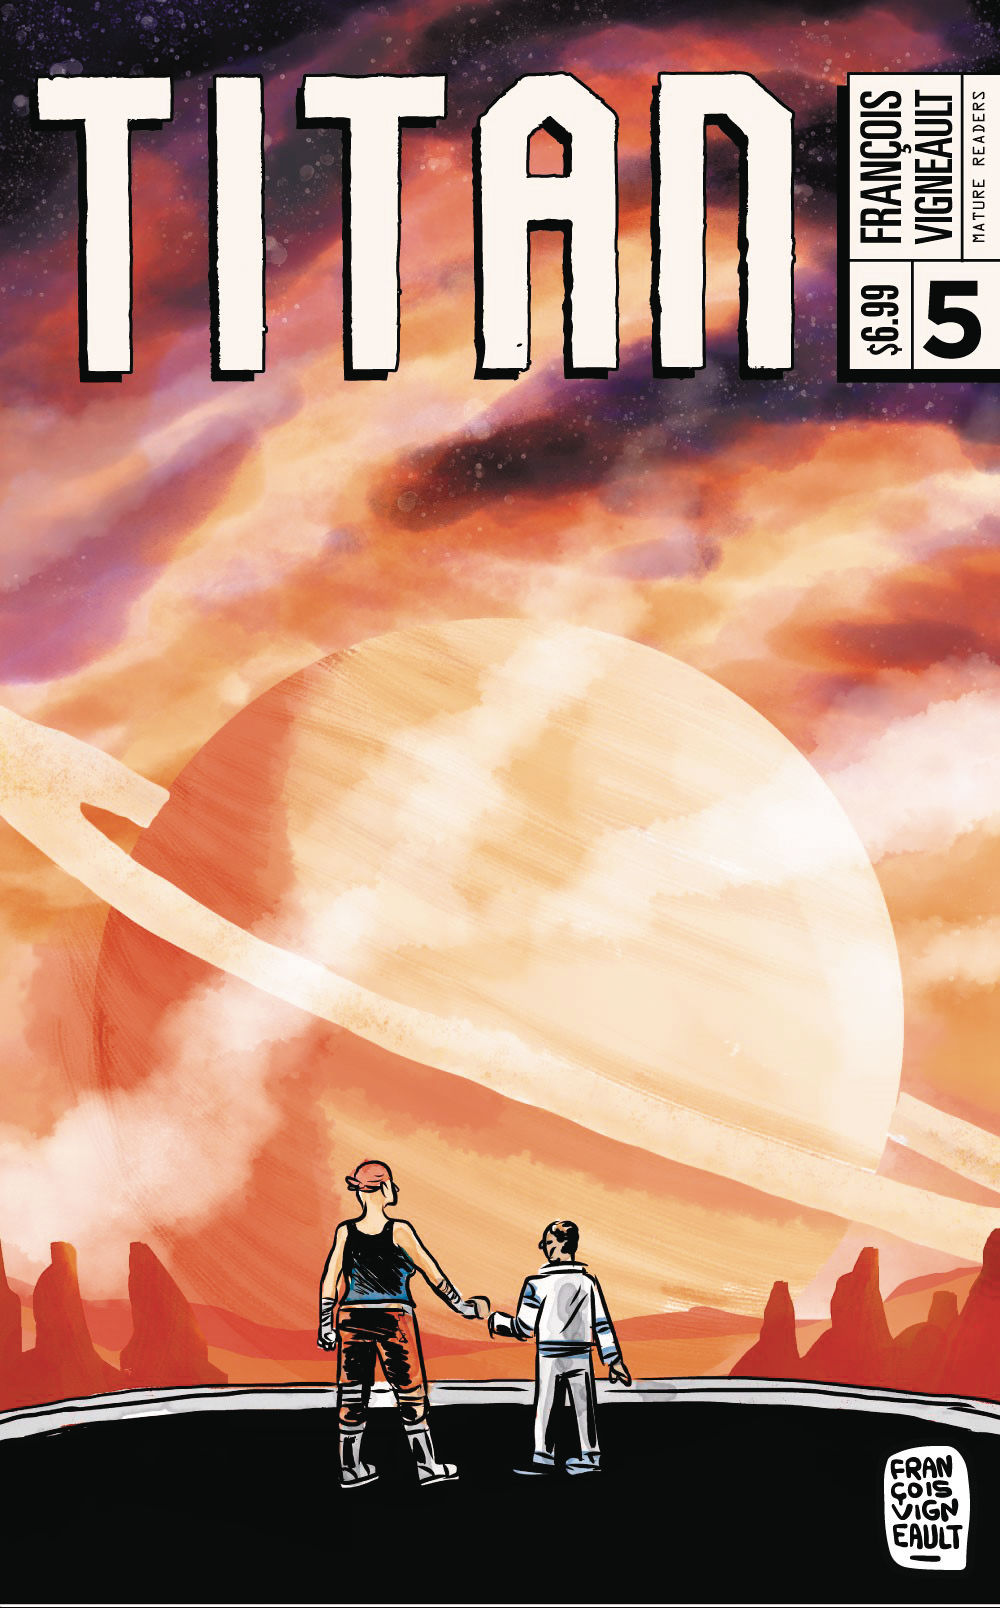 TITAN #5